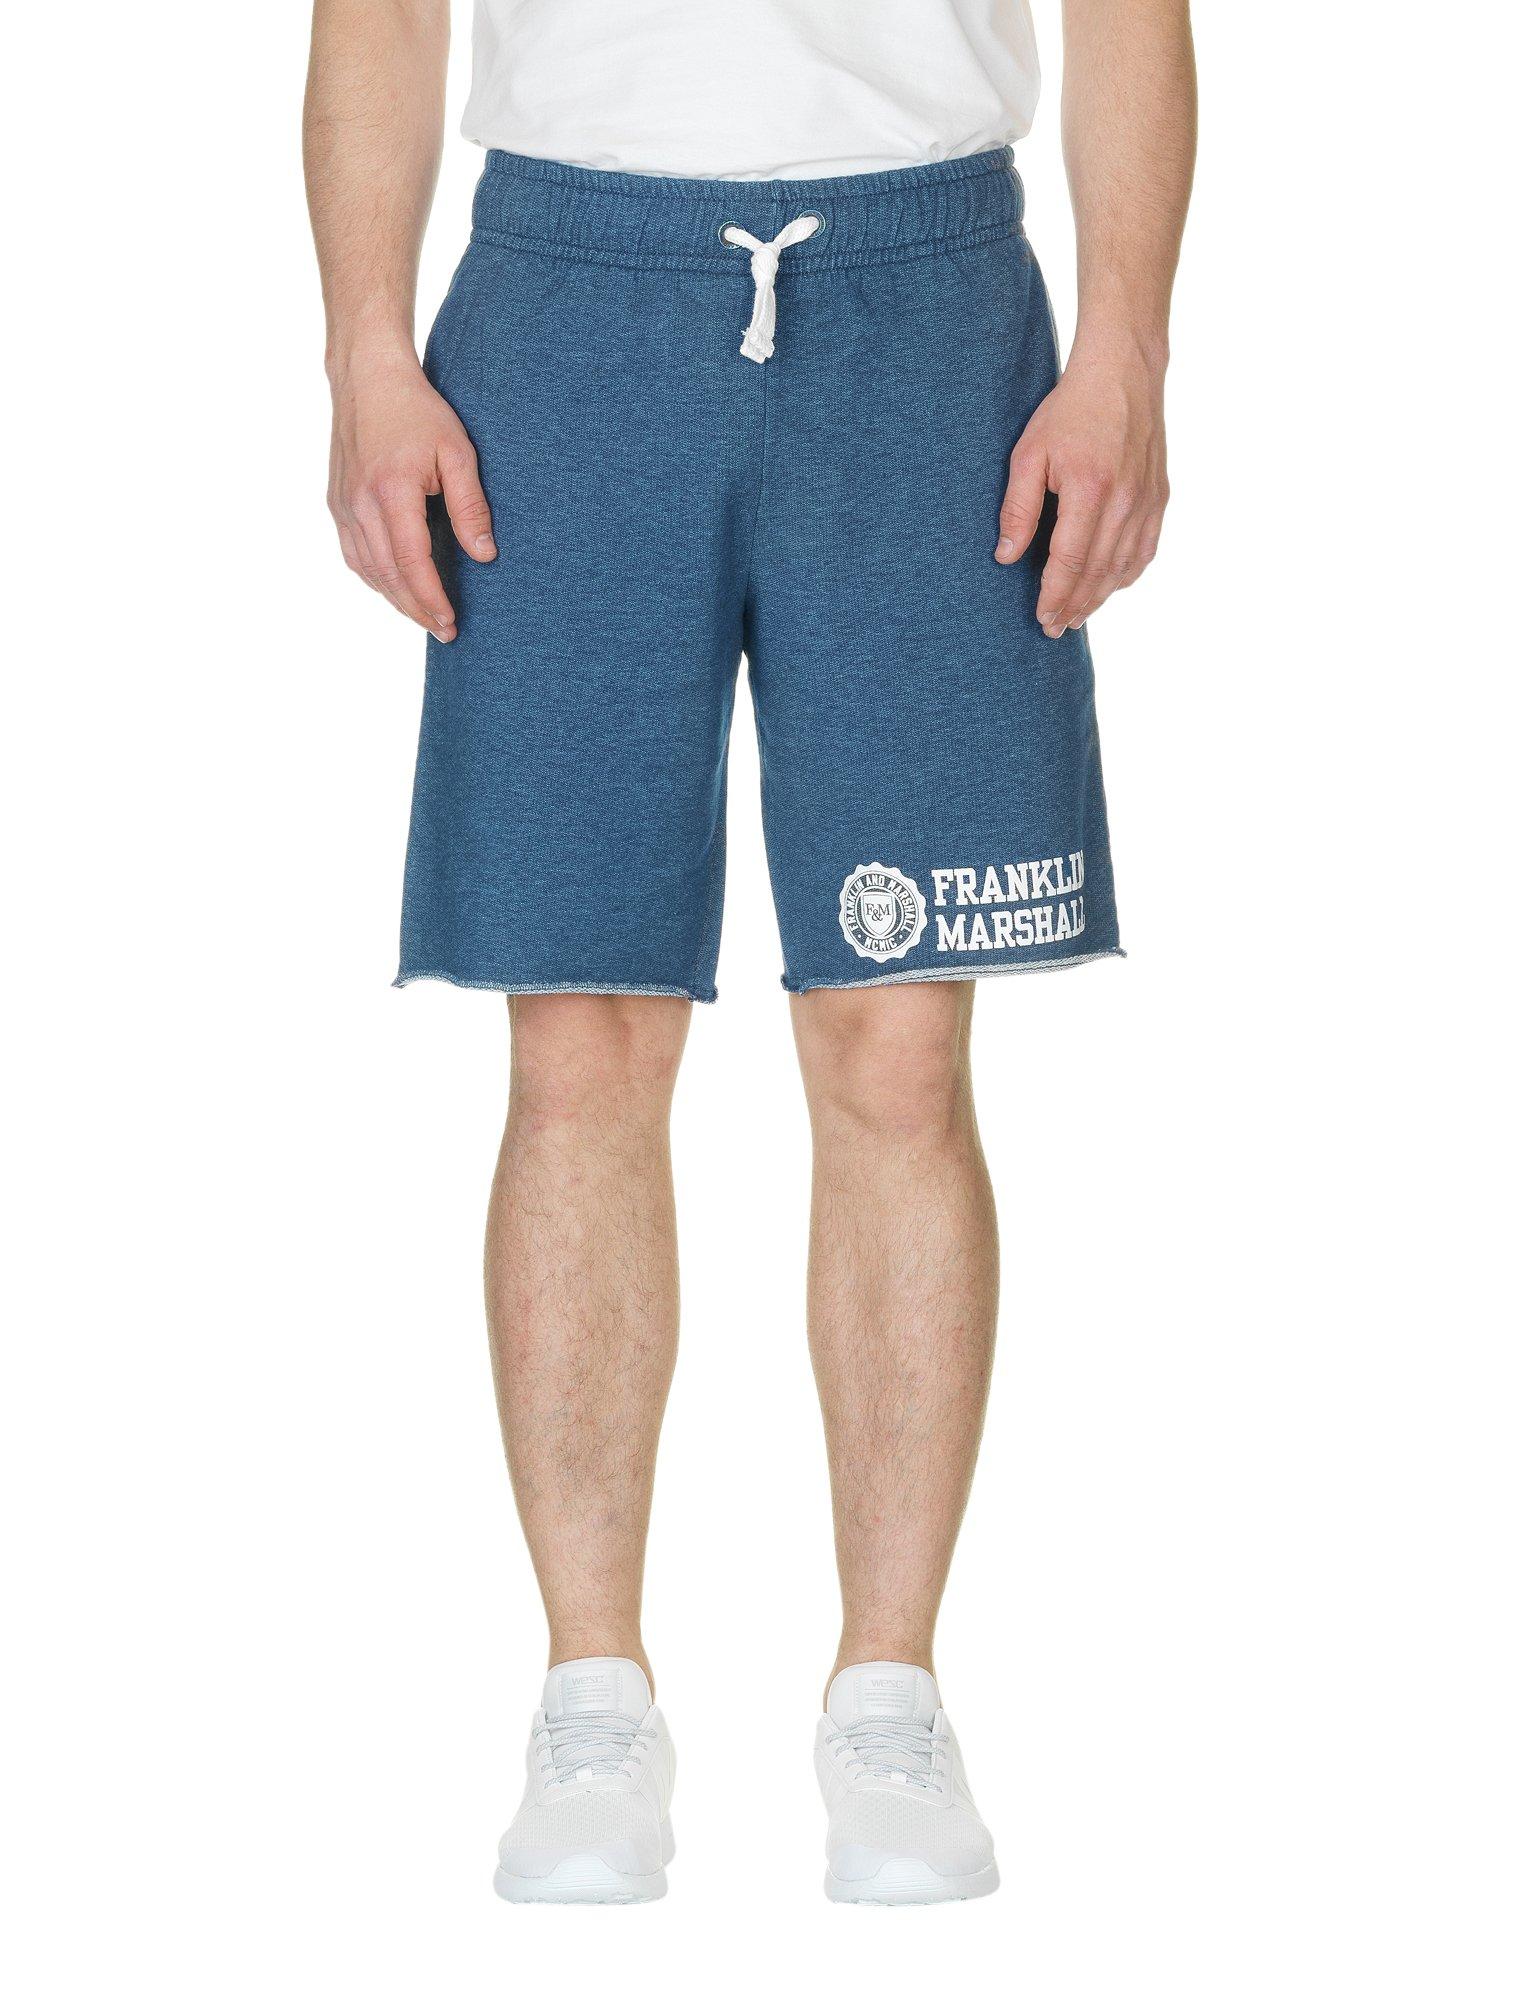 FRANKLIN & MARSHALL Men's Men's Blue Sports Bermuda Shorts in Size S Blue